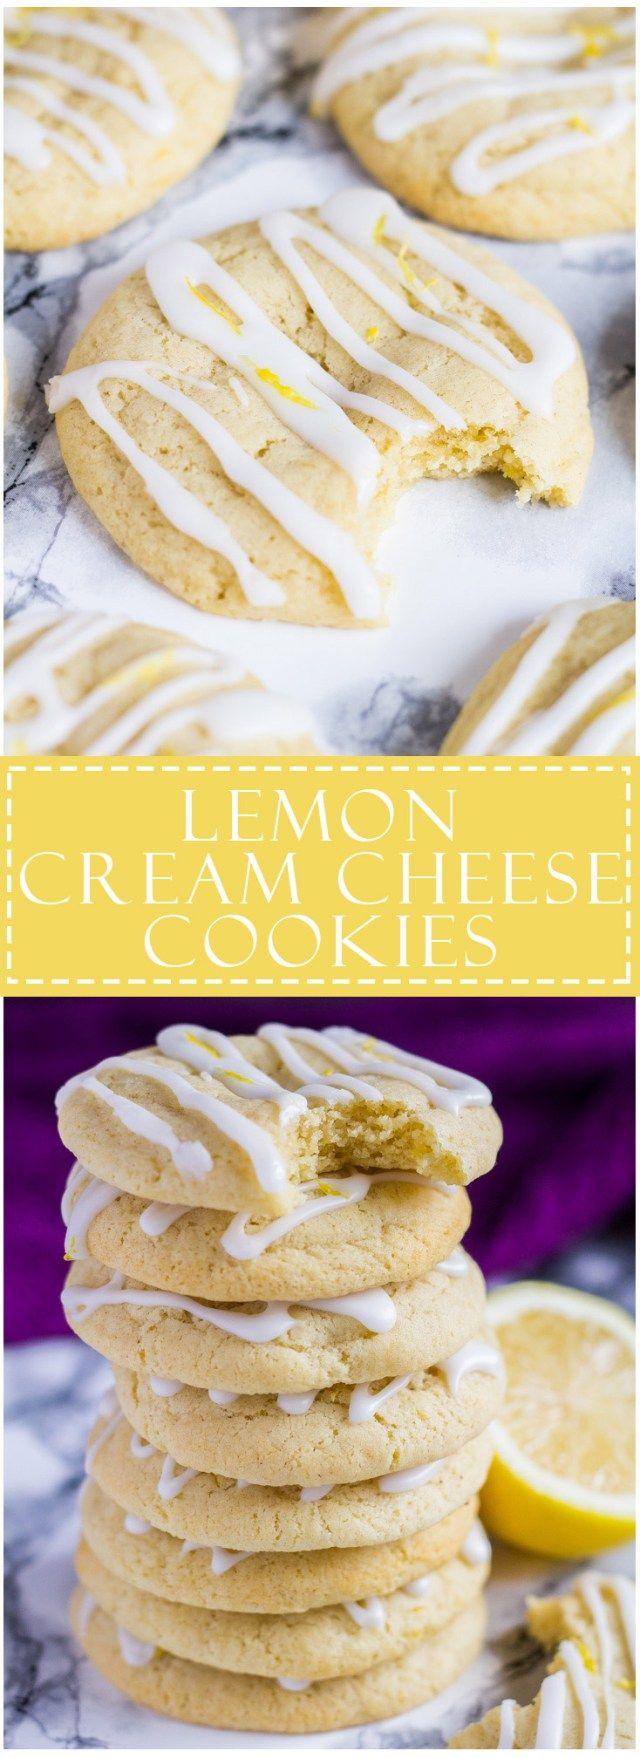 Soft and Chewy Lemon Cream Cheese Cookies | Marsha's Baking Addiction